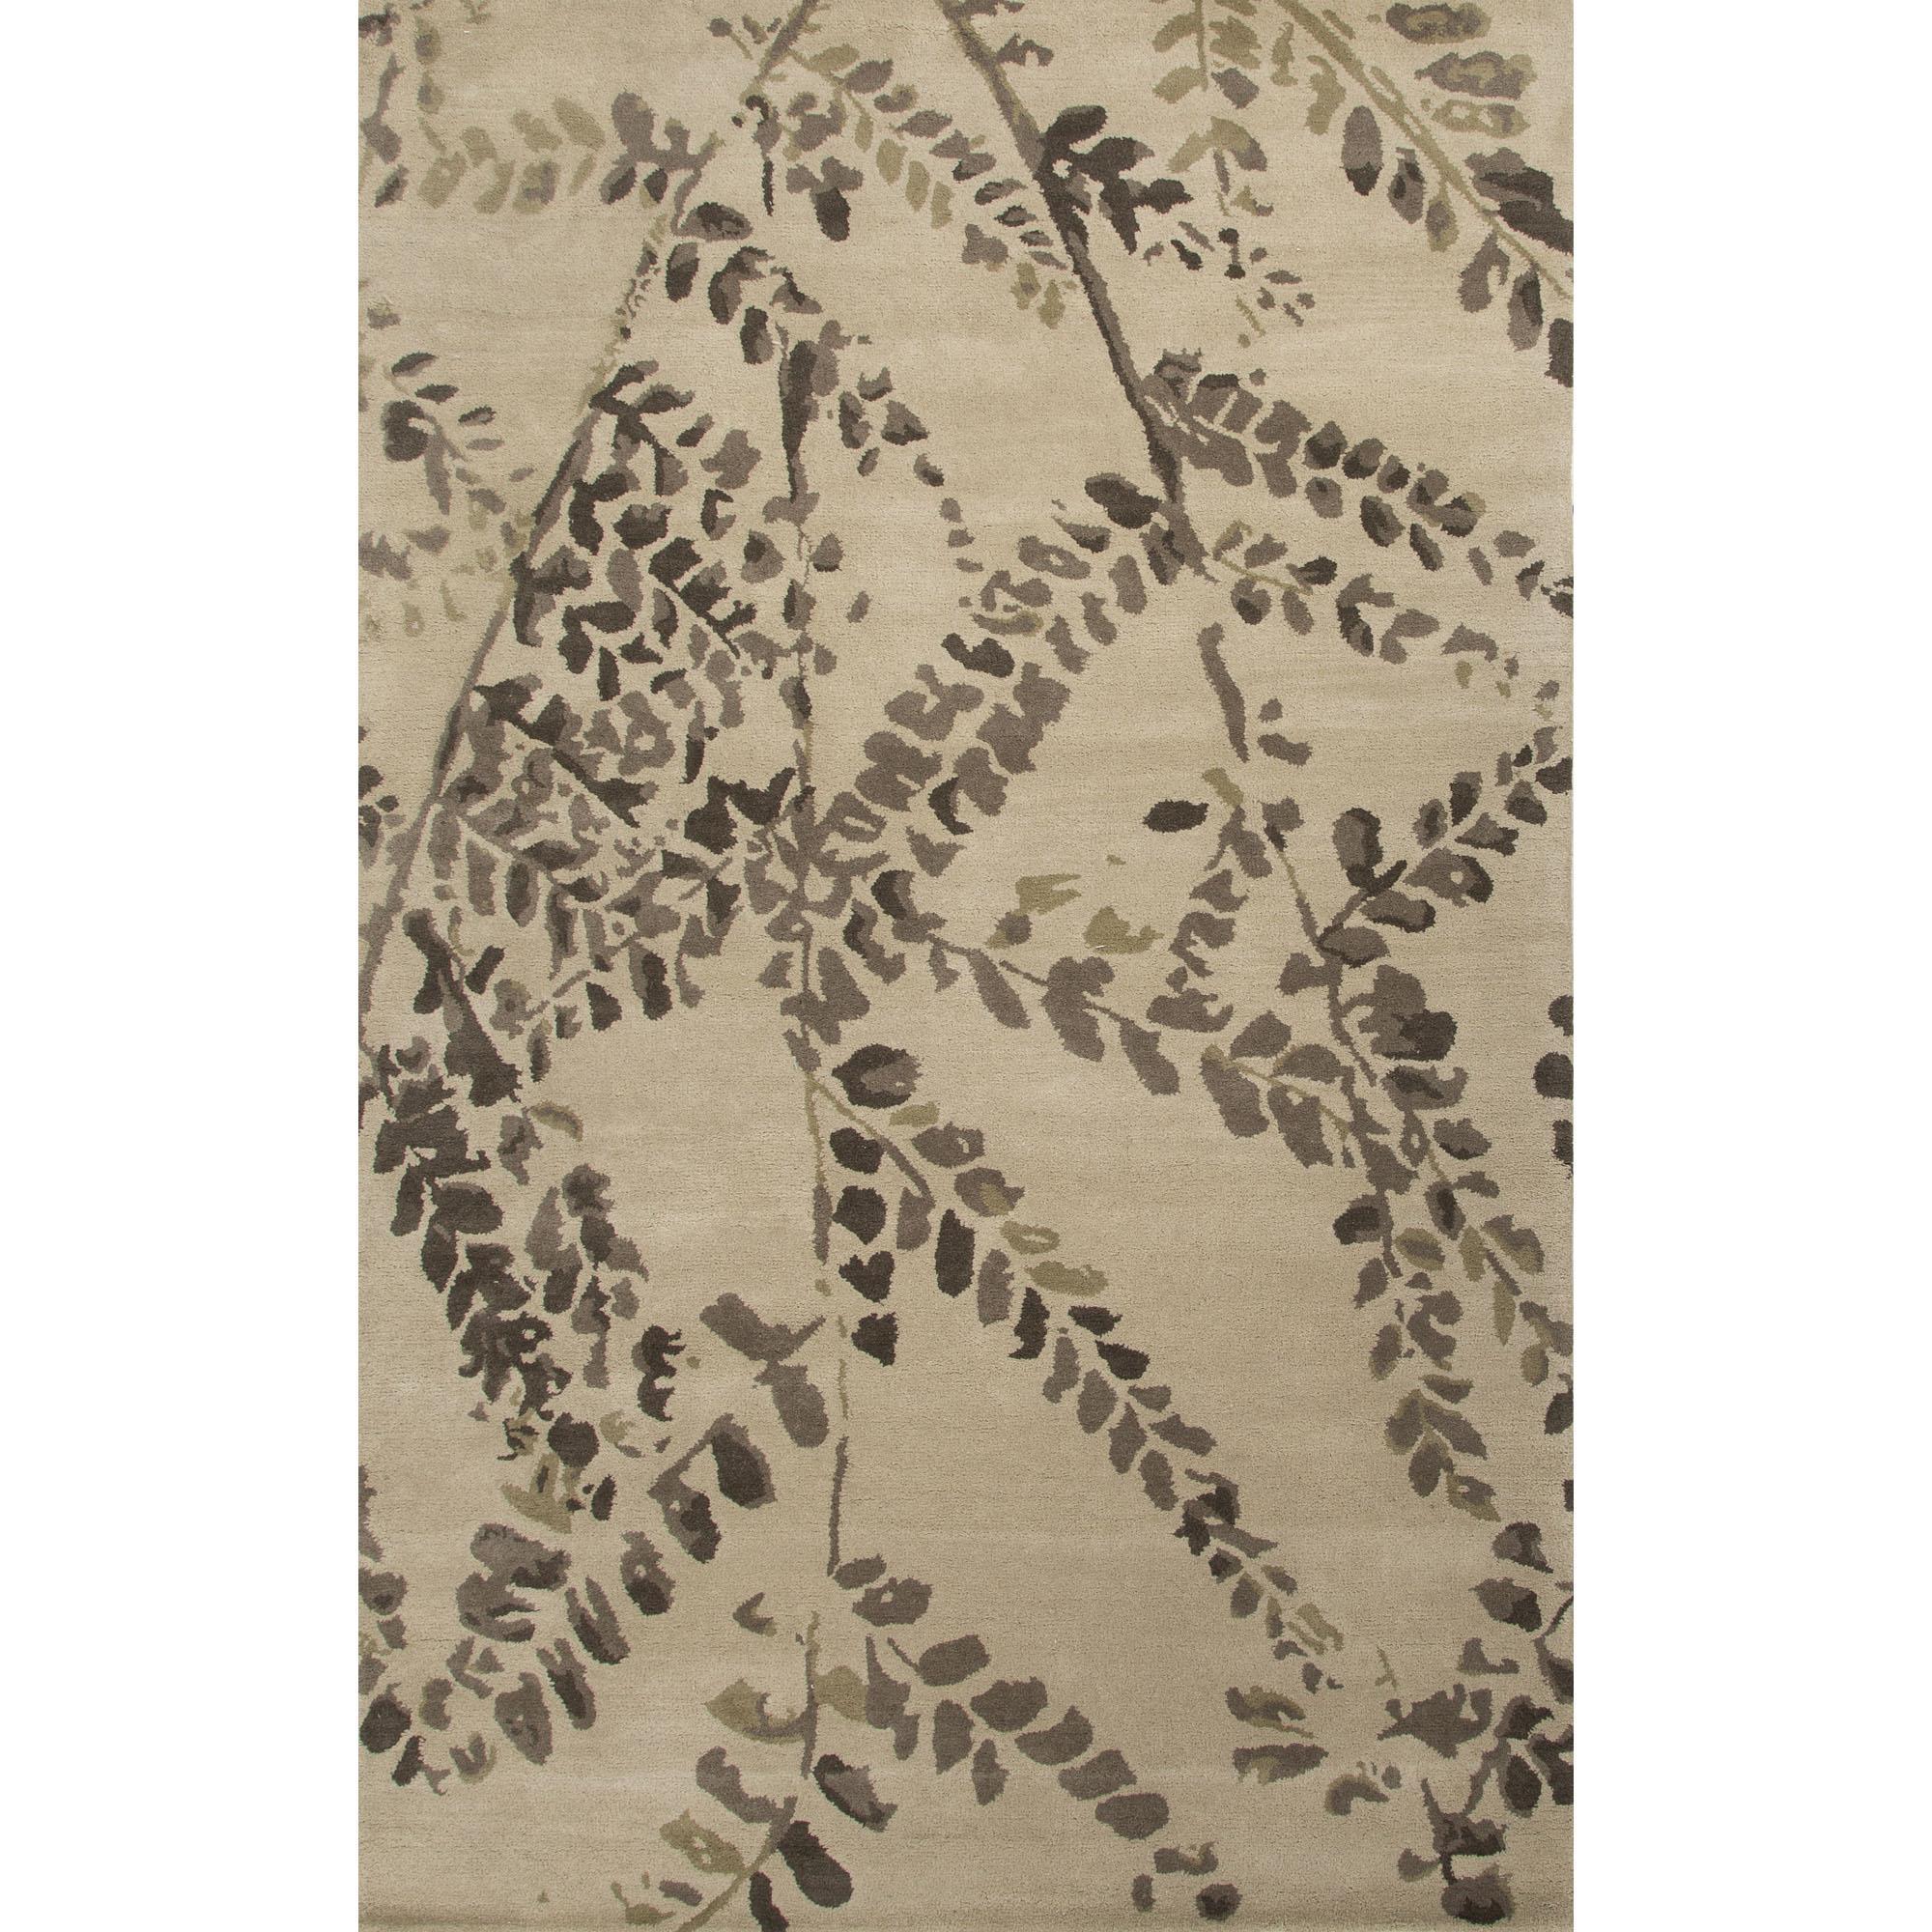 JAIPUR Rugs En Casa By Luli Sanchez Tufted 8 x 11 Rug - Item Number: RUG119066